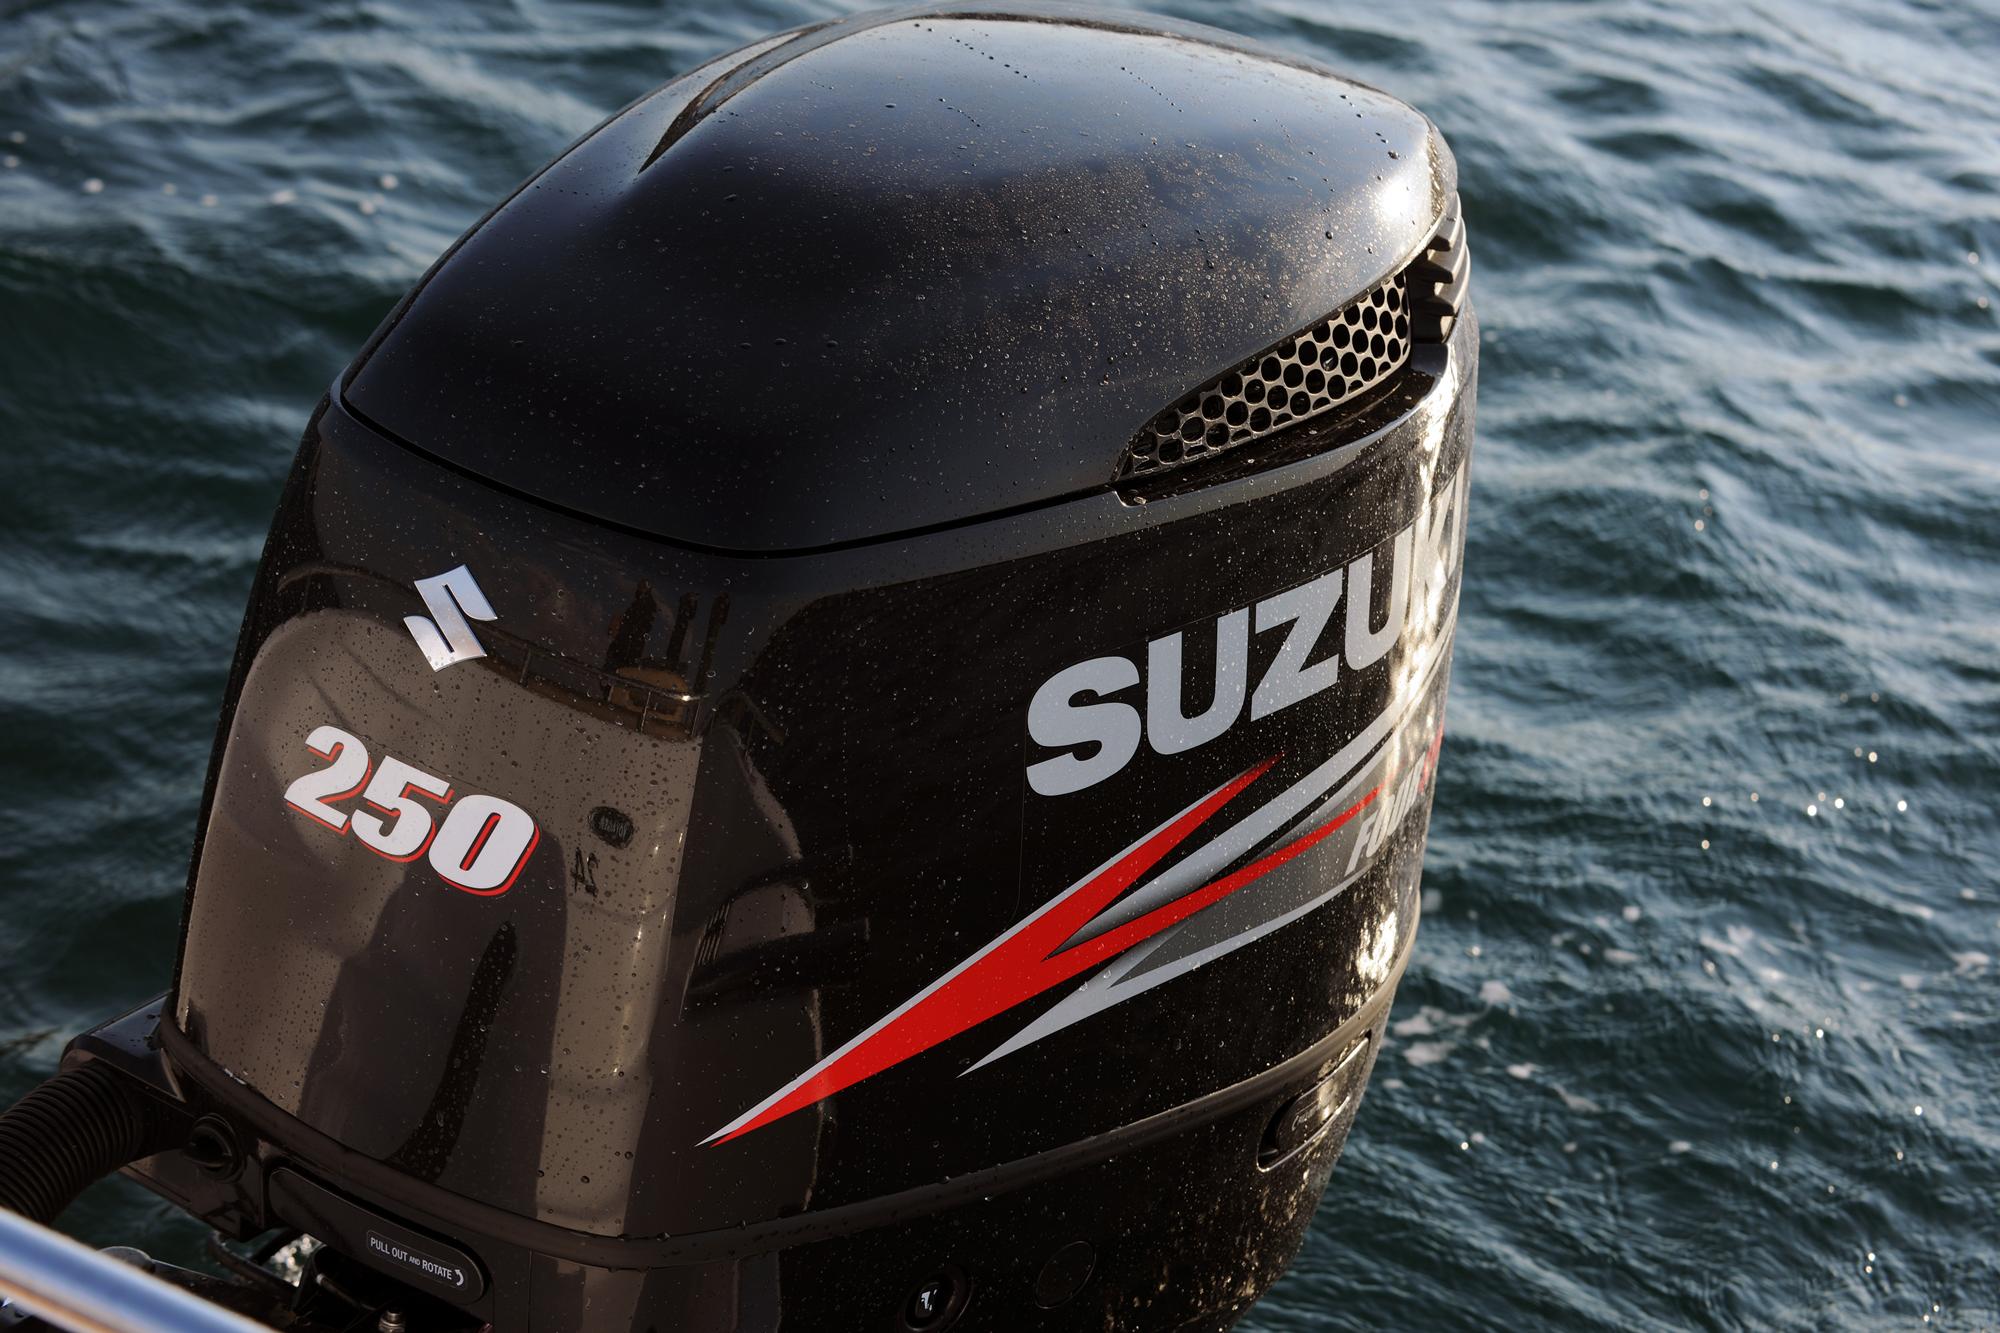 Outboard Motor Repair and Maintenance Tips | Salt Water